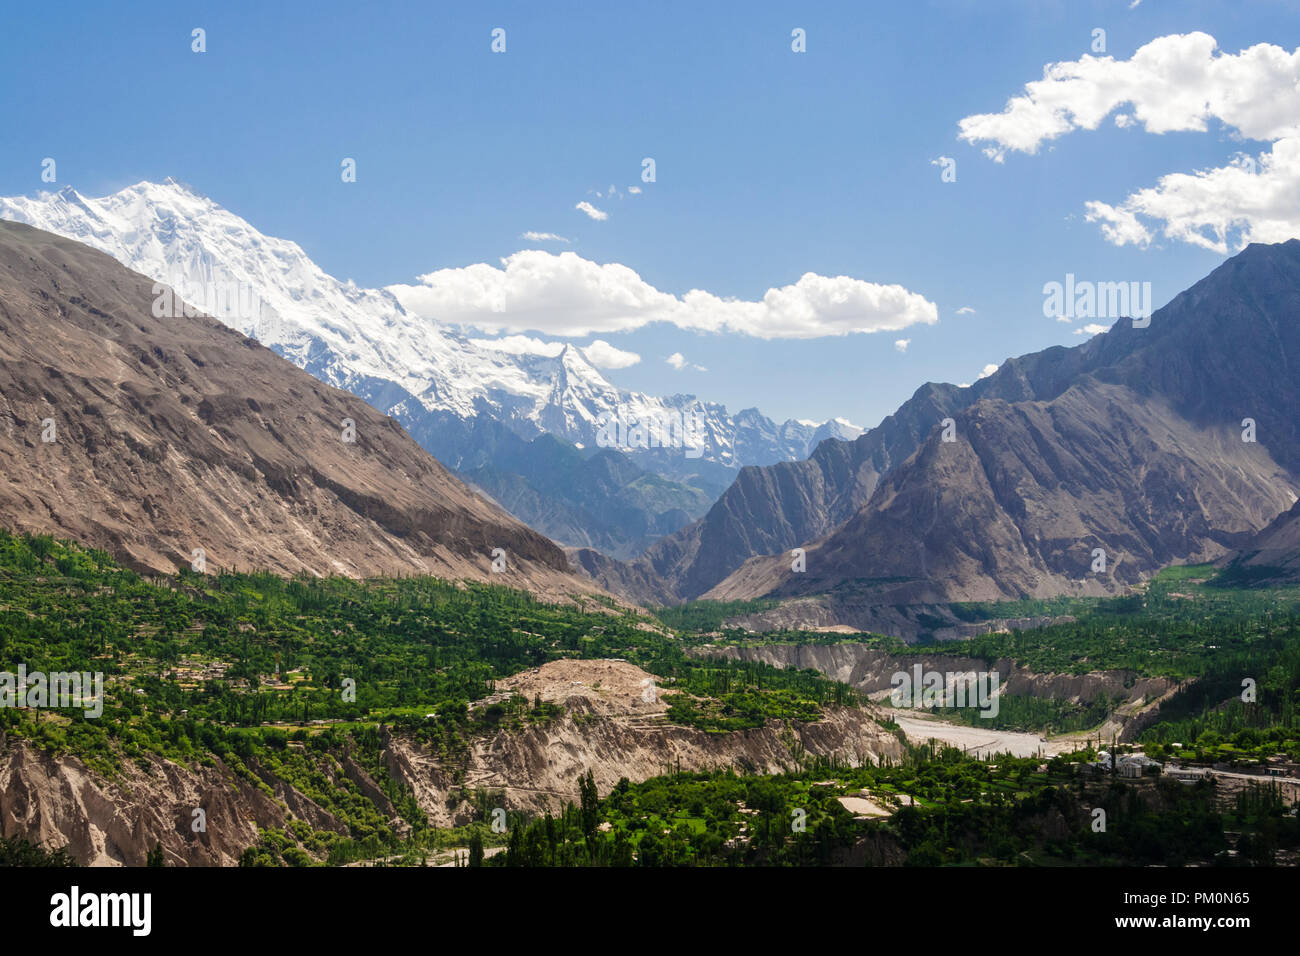 Karimabad, Hunza Valley, Gilgit-Baltistan, Pakistan : Rakaposhi mountain and Hunza Valley in the Karakoram range. At 7,788 m (25,551 ft) Rakaposhi is  - Stock Image